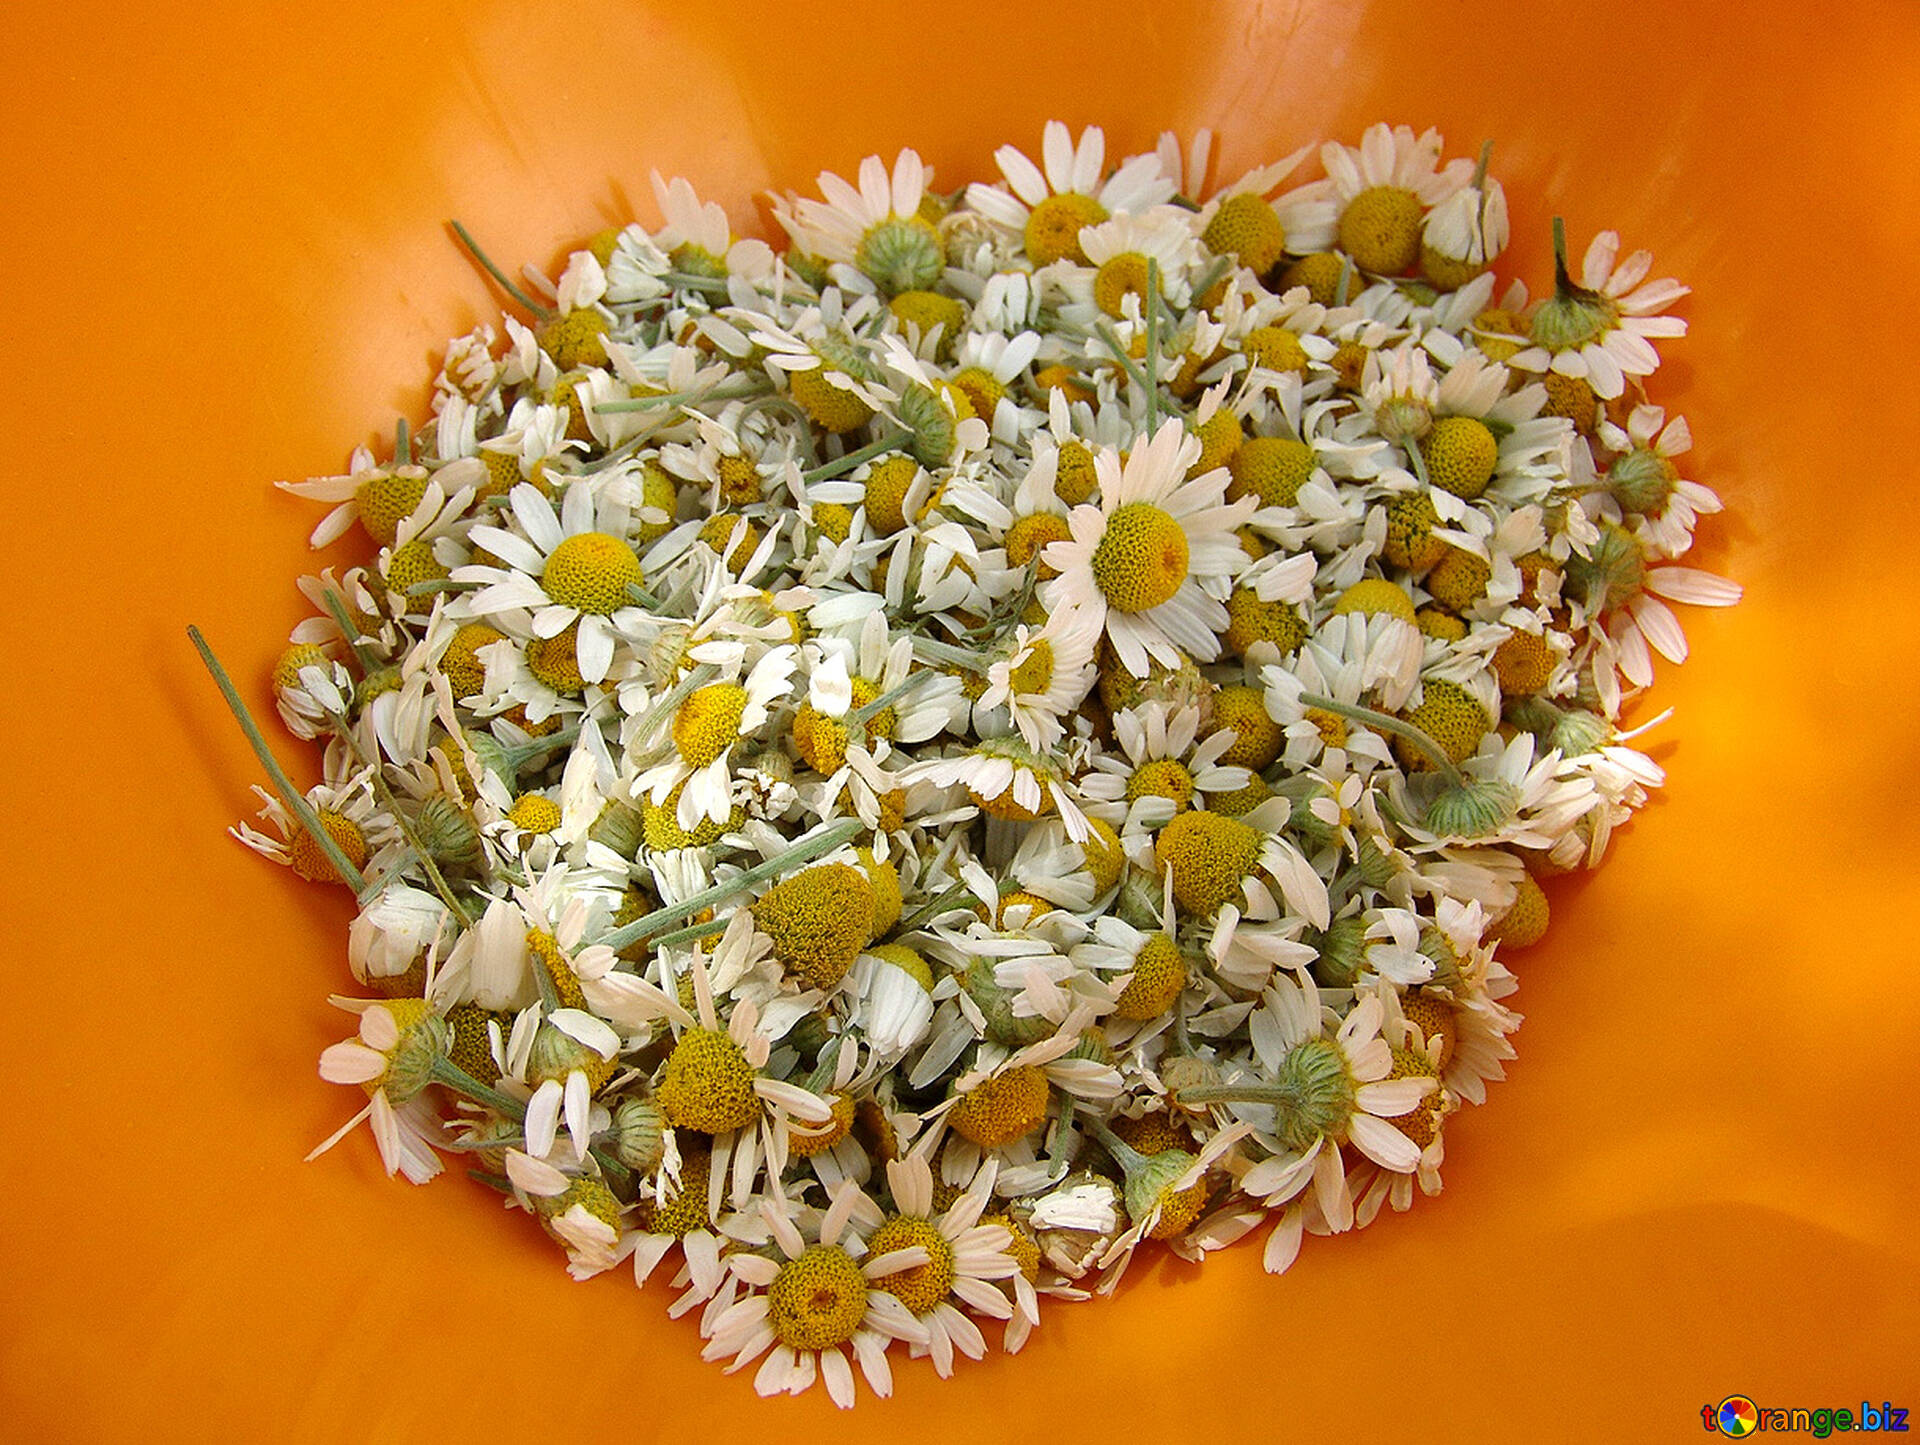 fleurs de camomille drogue de camomille fleur 5833. Black Bedroom Furniture Sets. Home Design Ideas